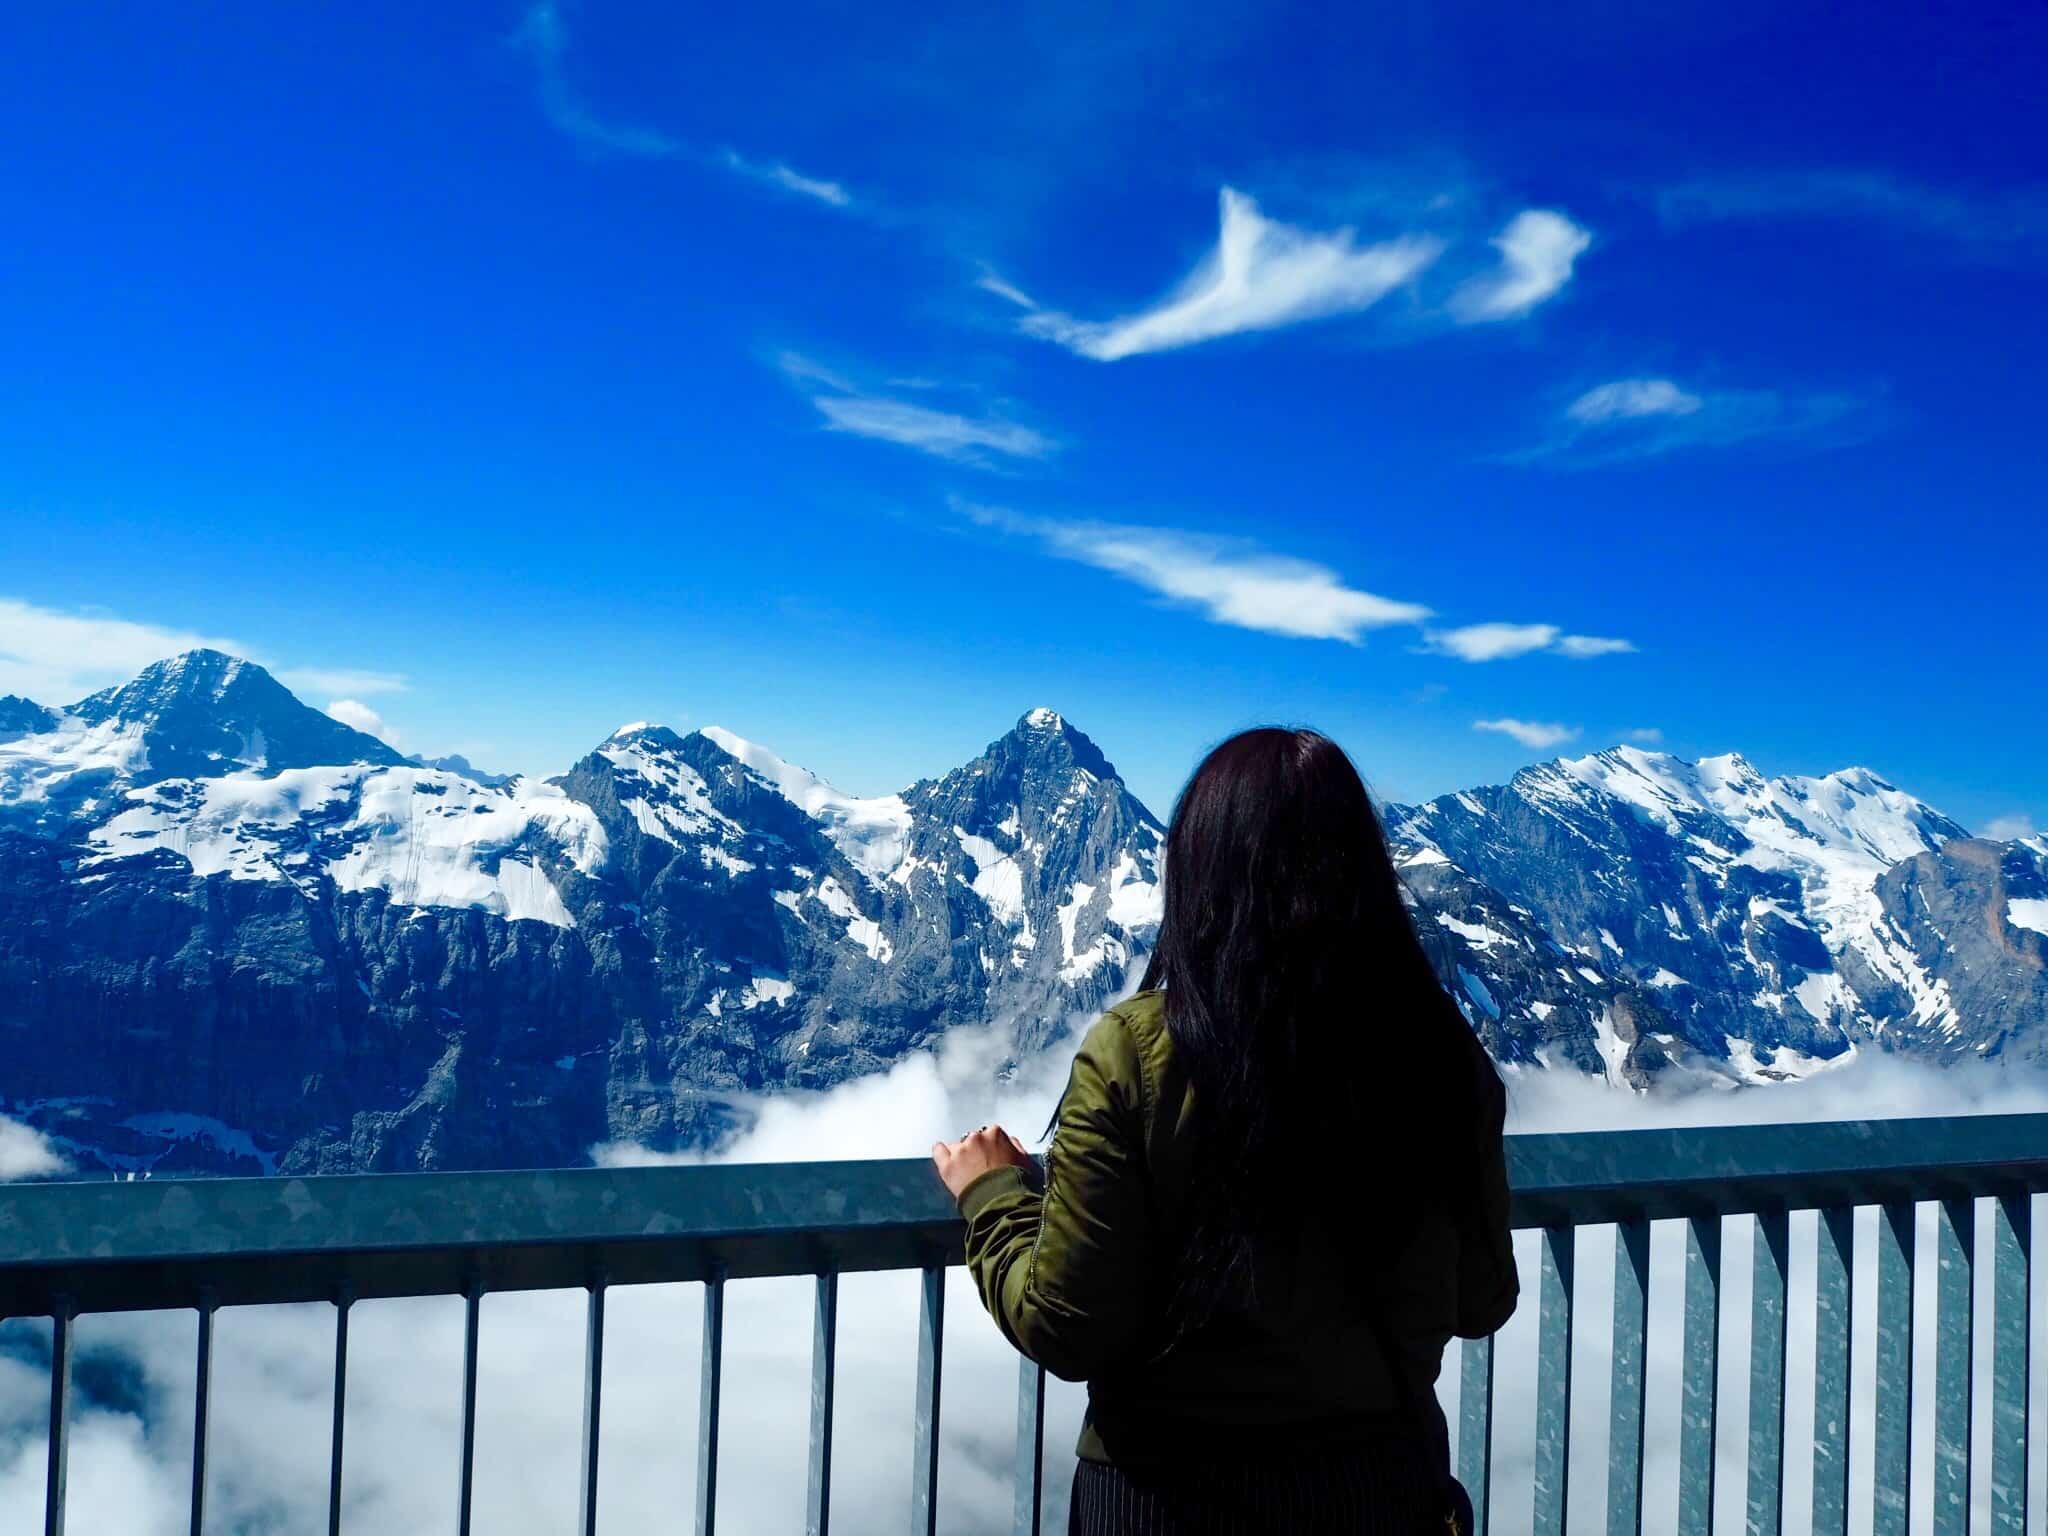 Girl overlooking the mountain view of Schilthorn Piz Gloria James Bond film location